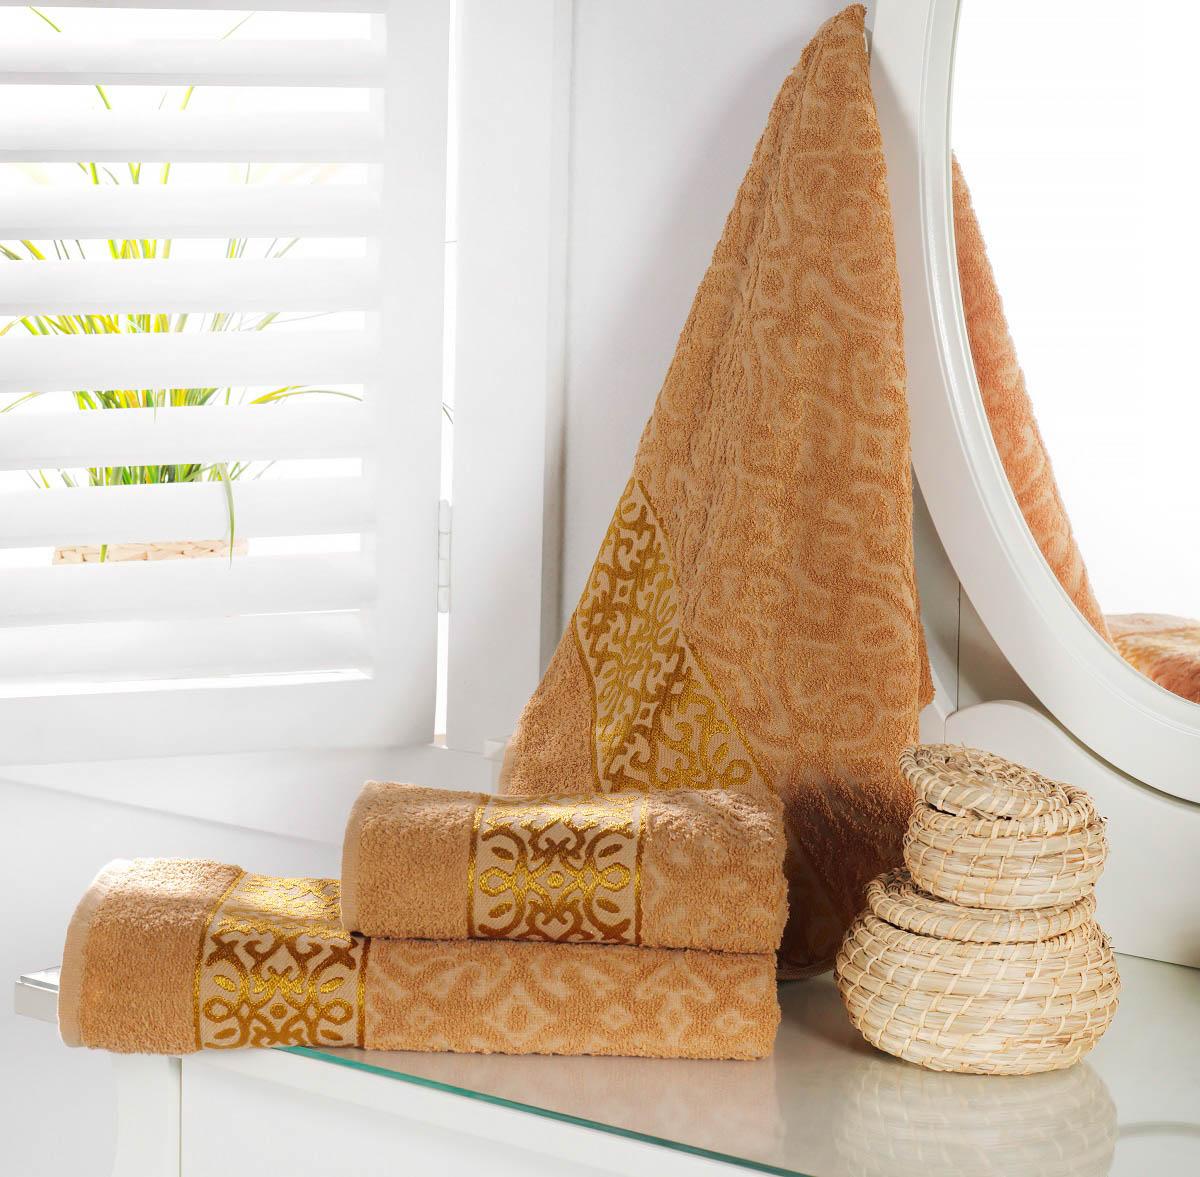 Полотенца Karna Полотенце Sahra Цвет: Бежевый (70х140 см) karna karna полотенце innes цвет красный 70х140 см